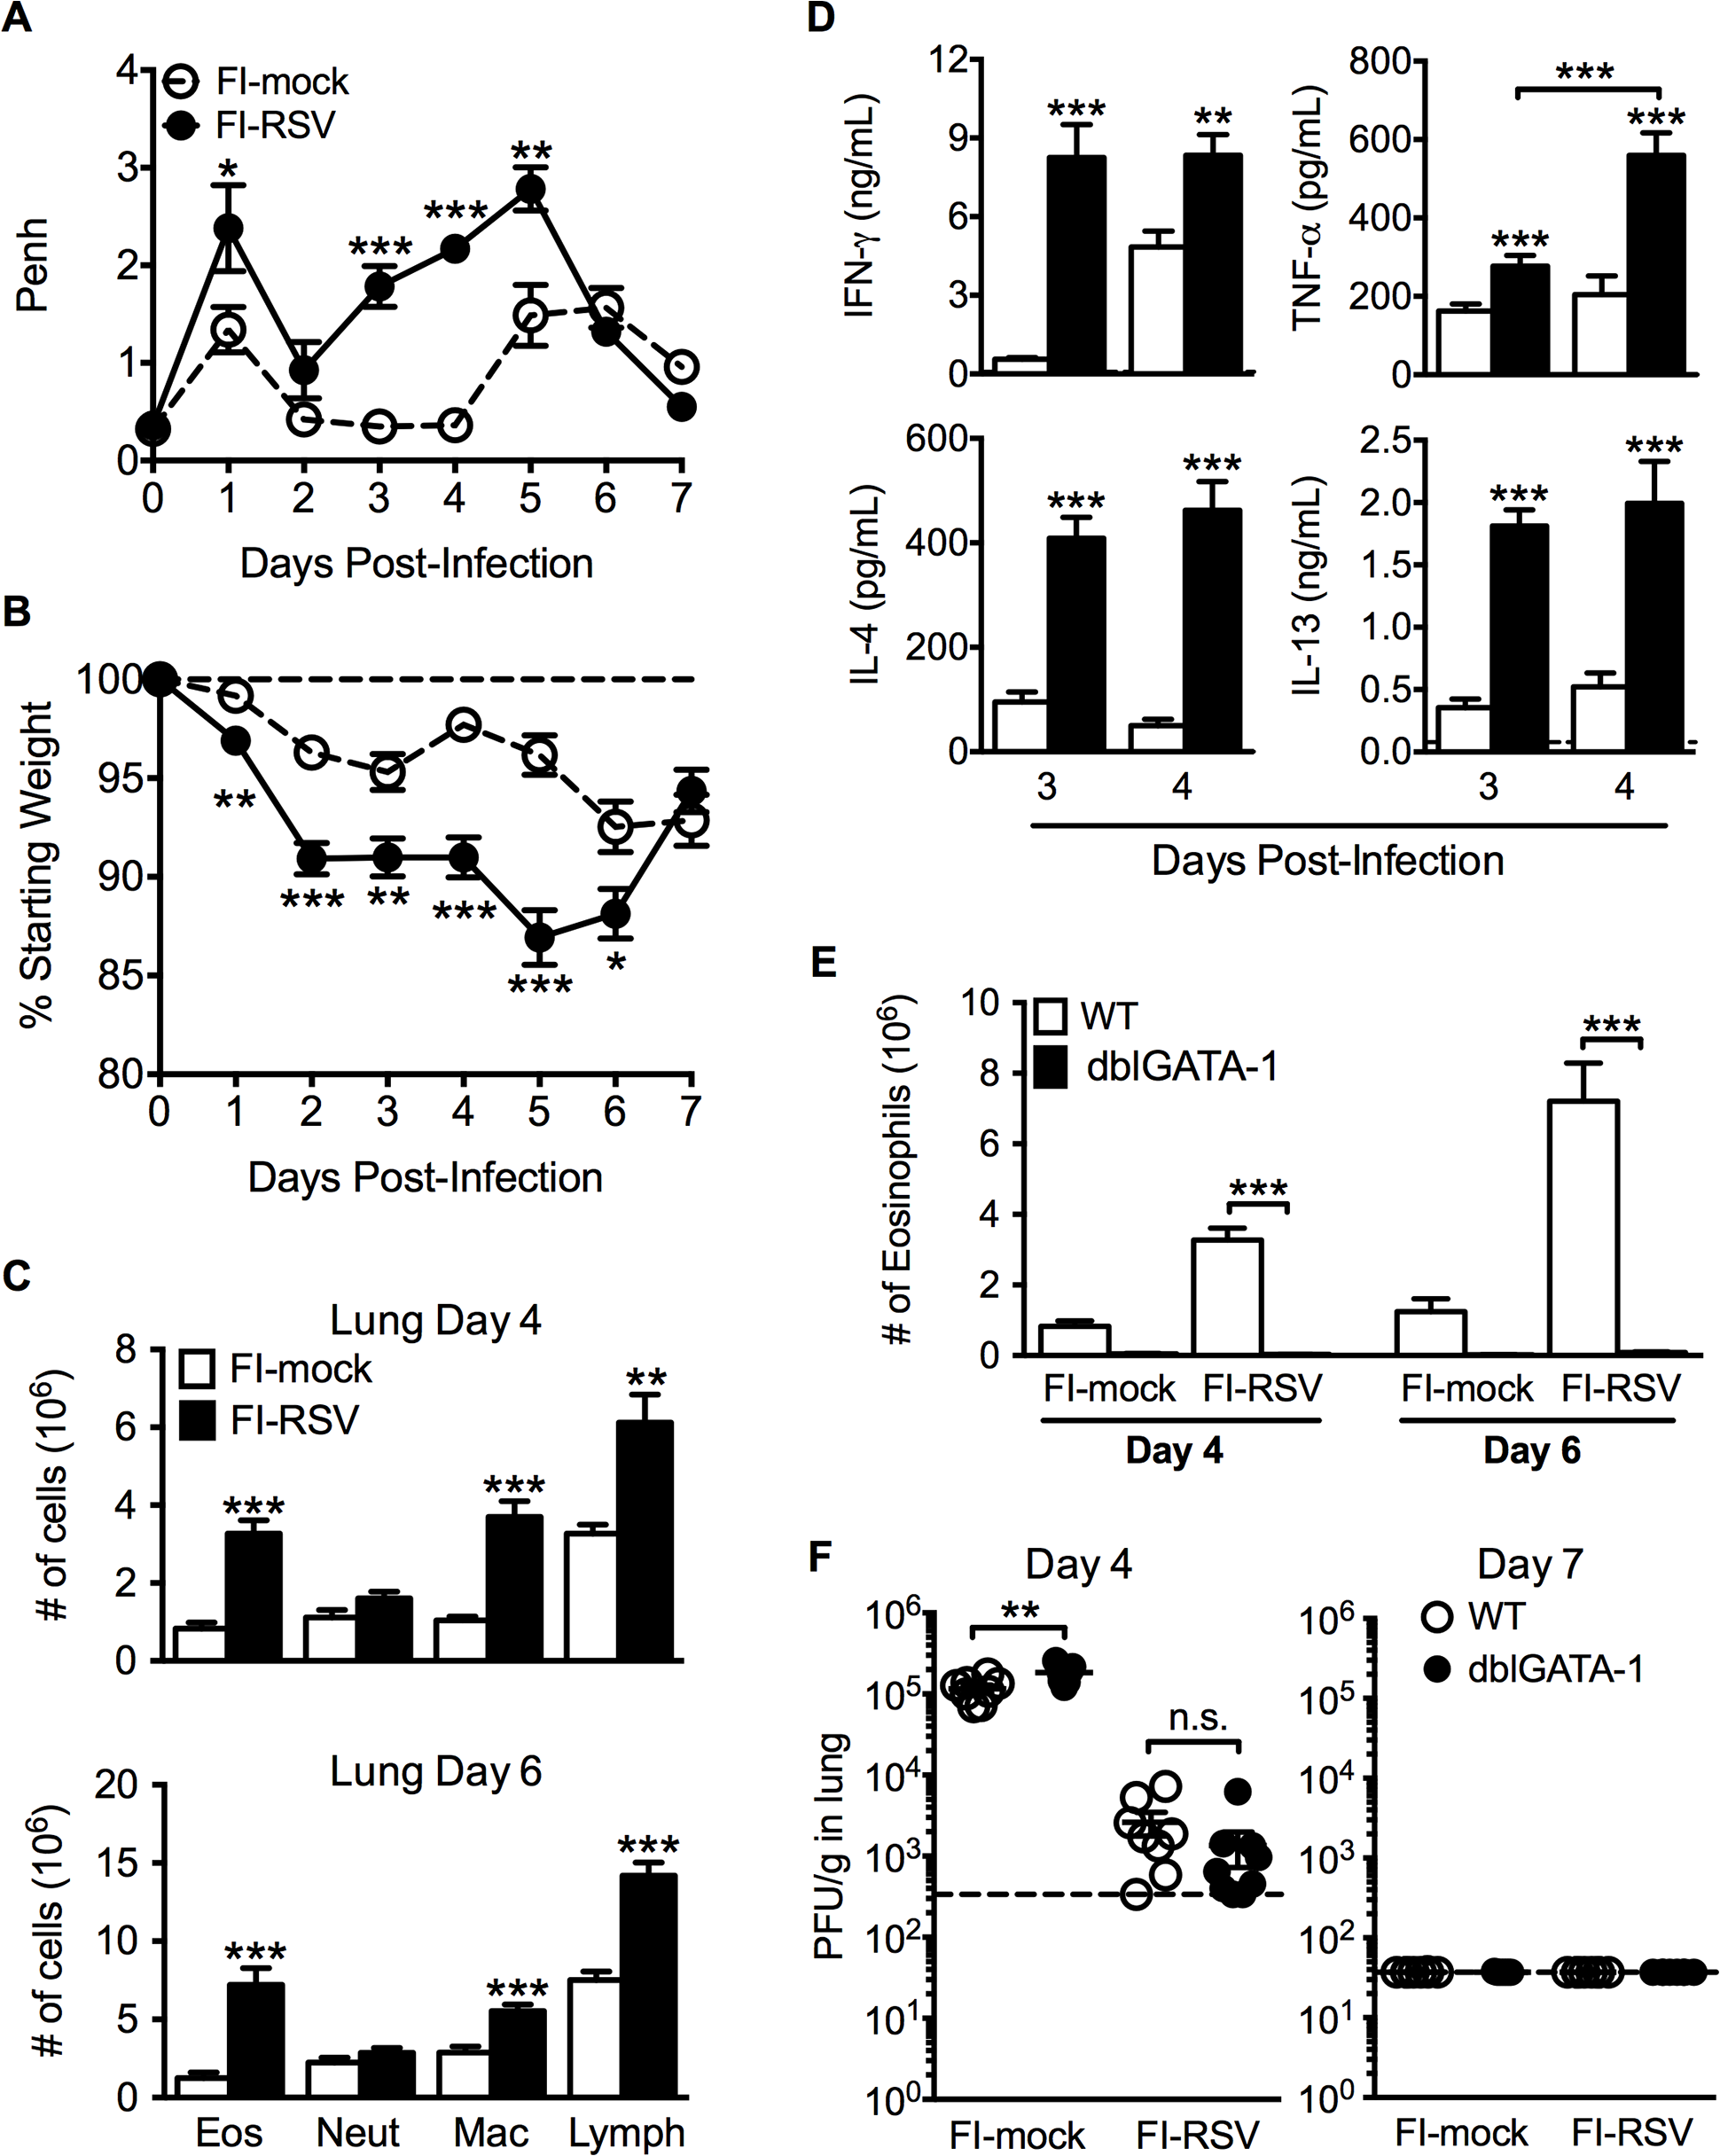 Development of VED following RSV challenge of FI-RSV-immunized mice.